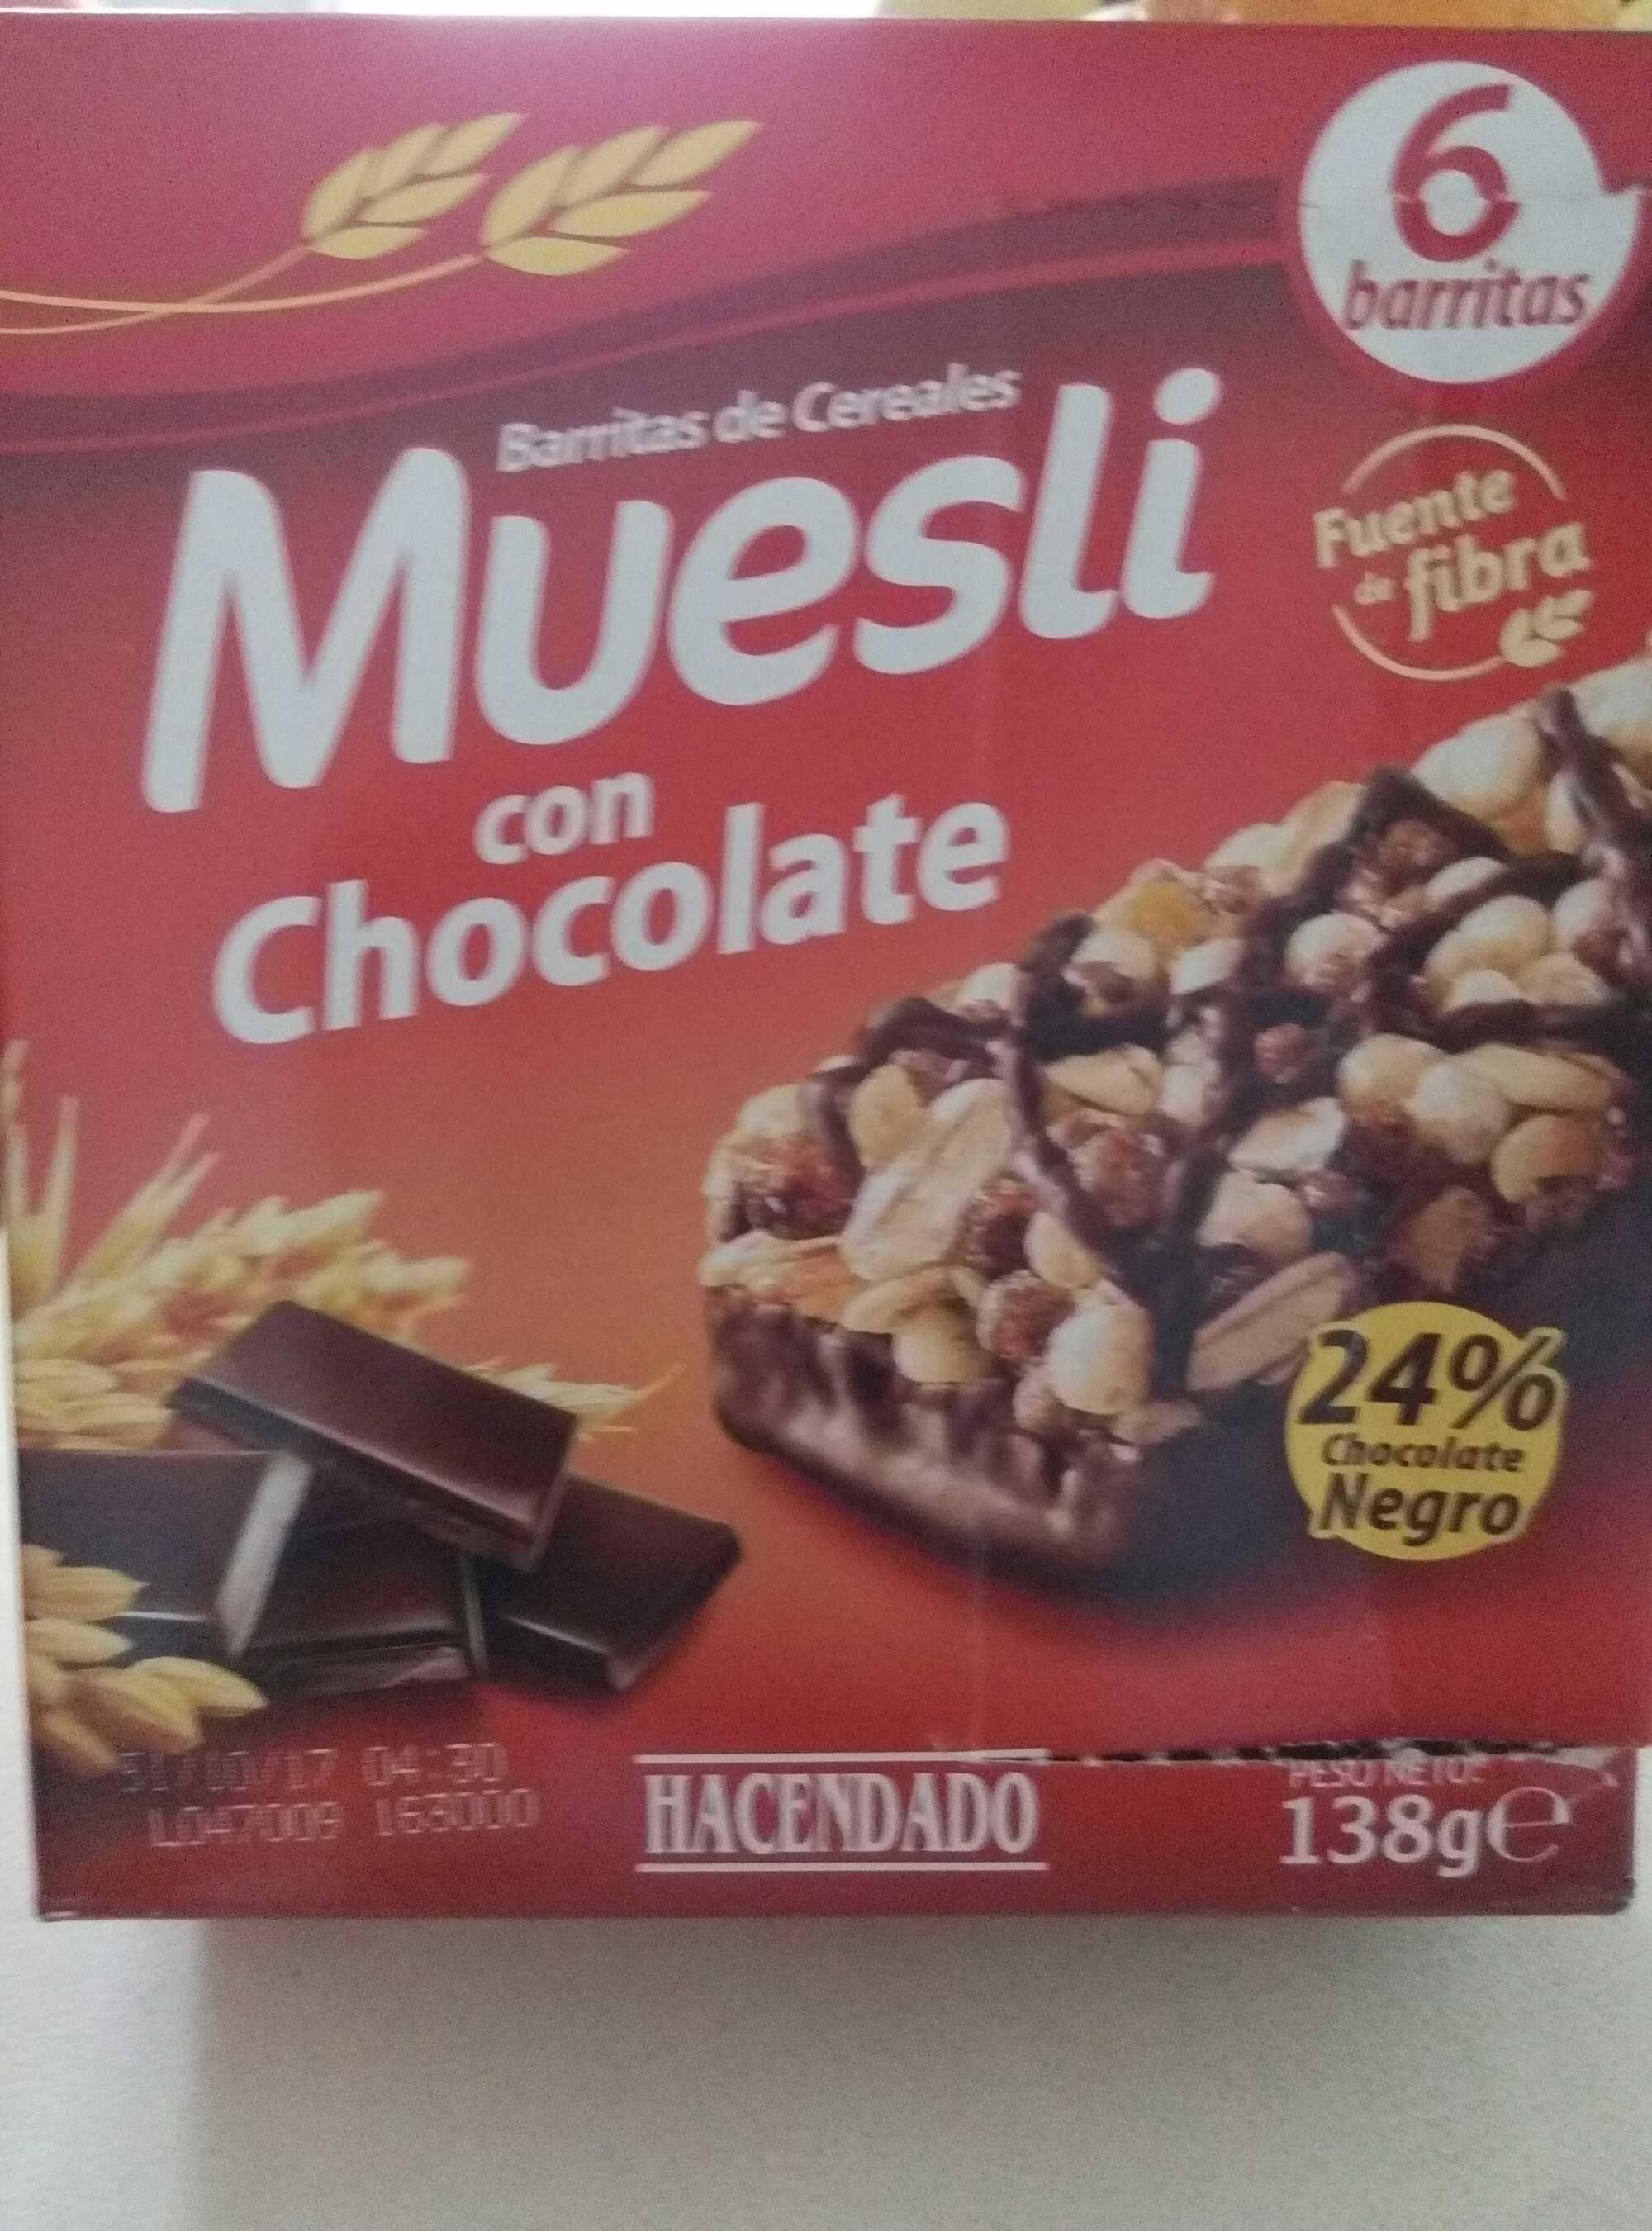 Barritas de cereales muesli con chocolate - Produit